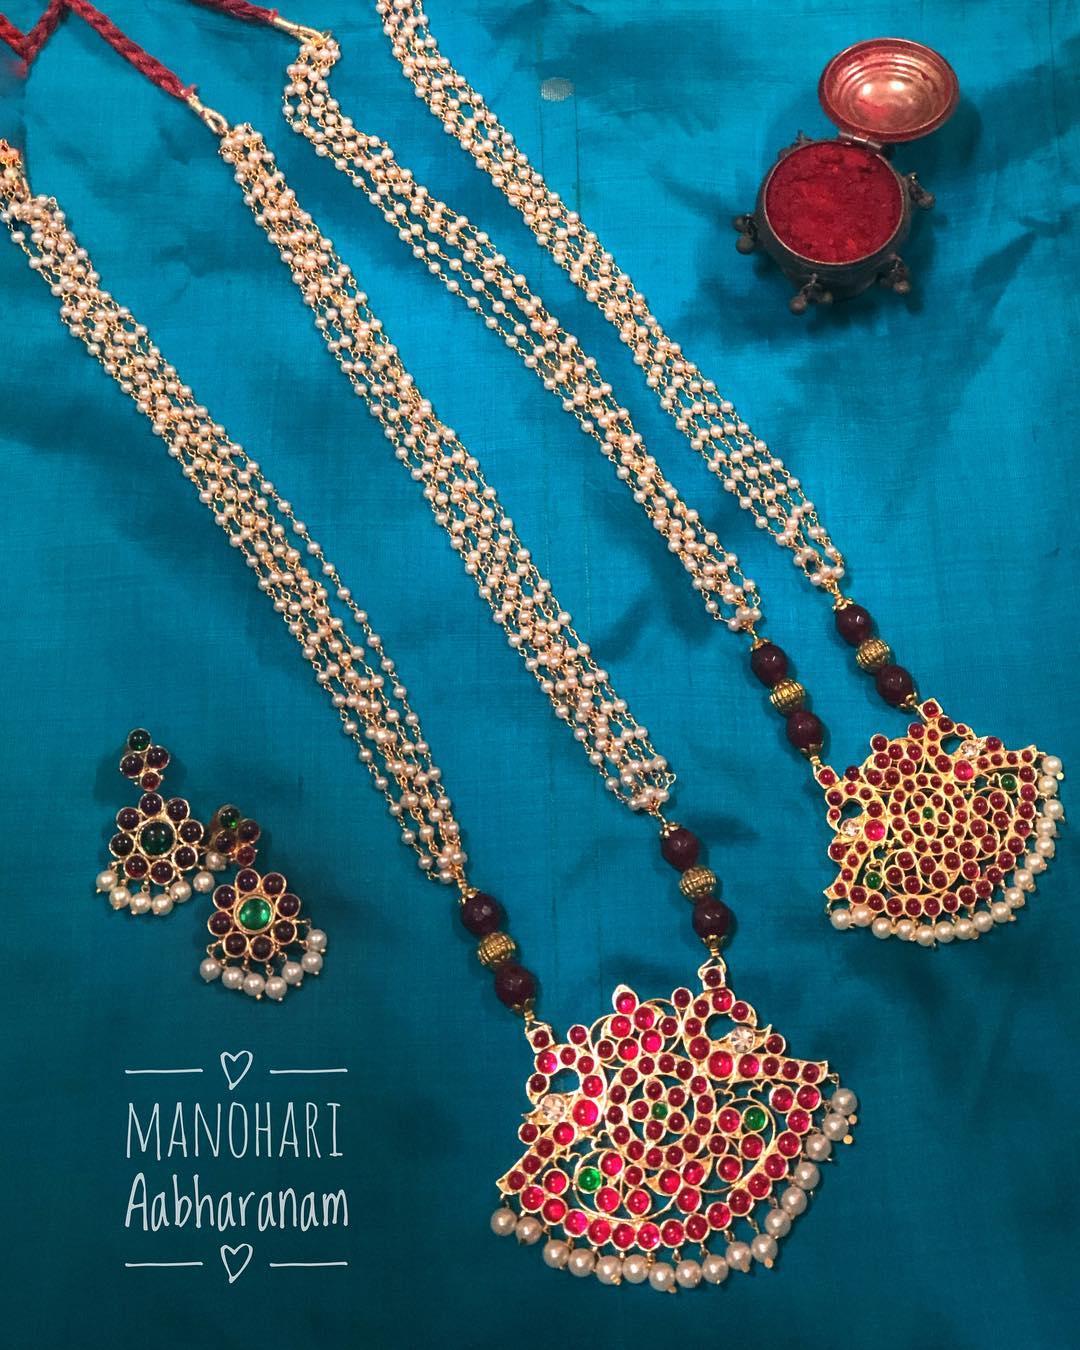 kemp-jewellery-designs-2019 (4)